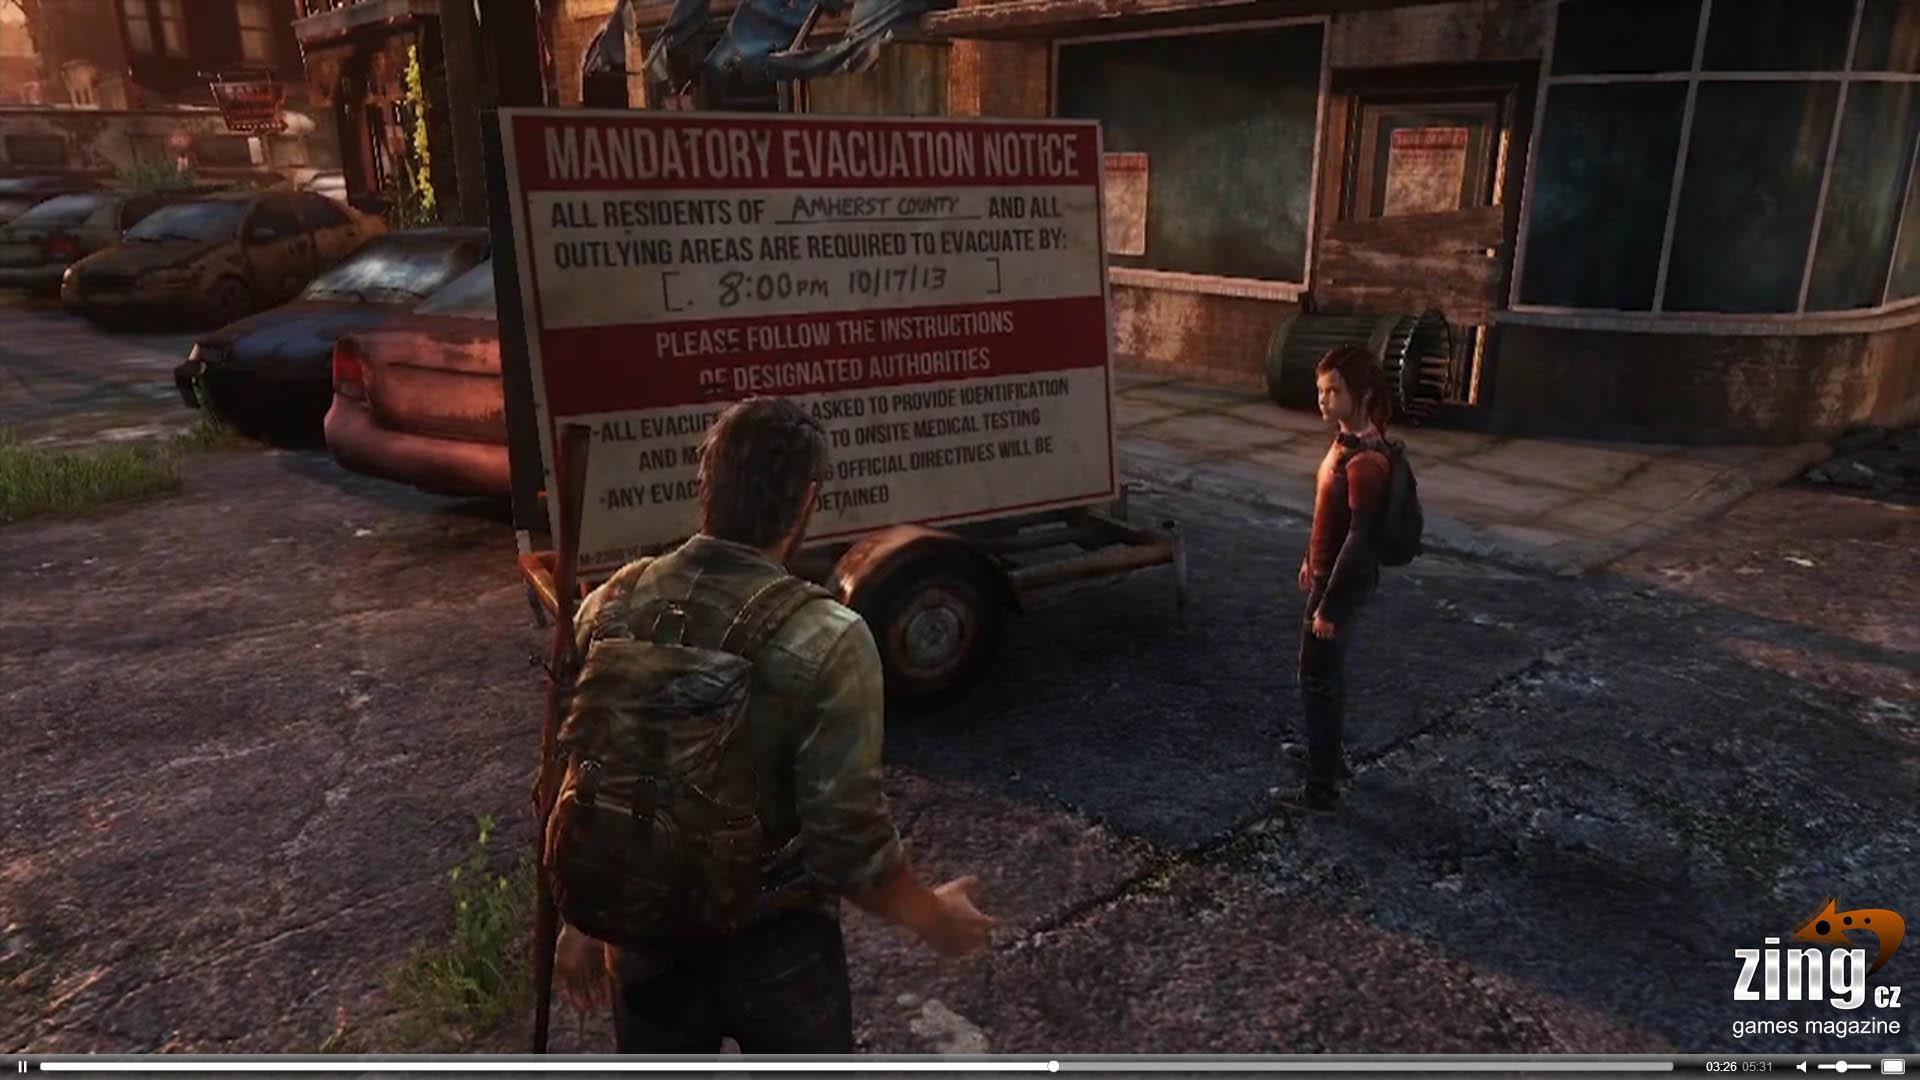 Prozradila cedule s evakuací v The Last of Us datum Uncharted 4 nebo PS4? 80045